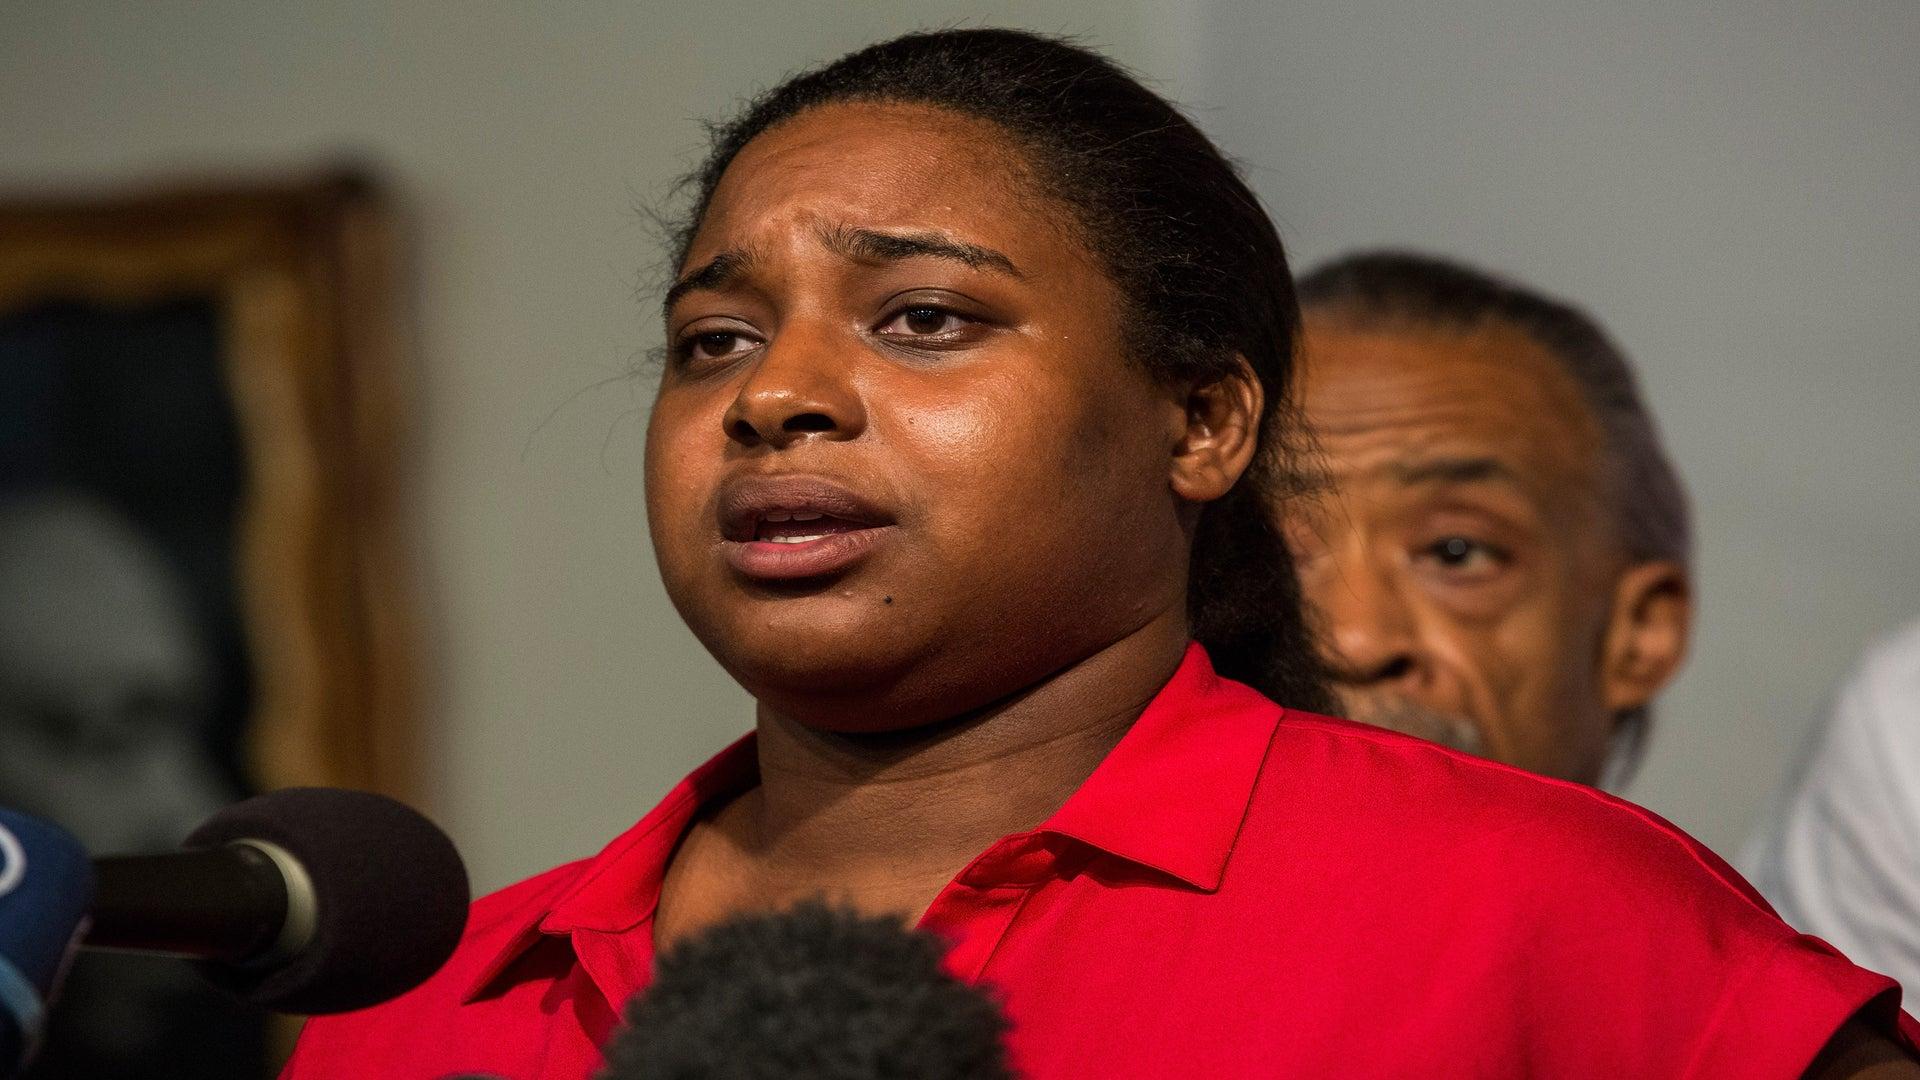 Activist Erica Garner, Daughter Of Eric Garner, Dead At 27